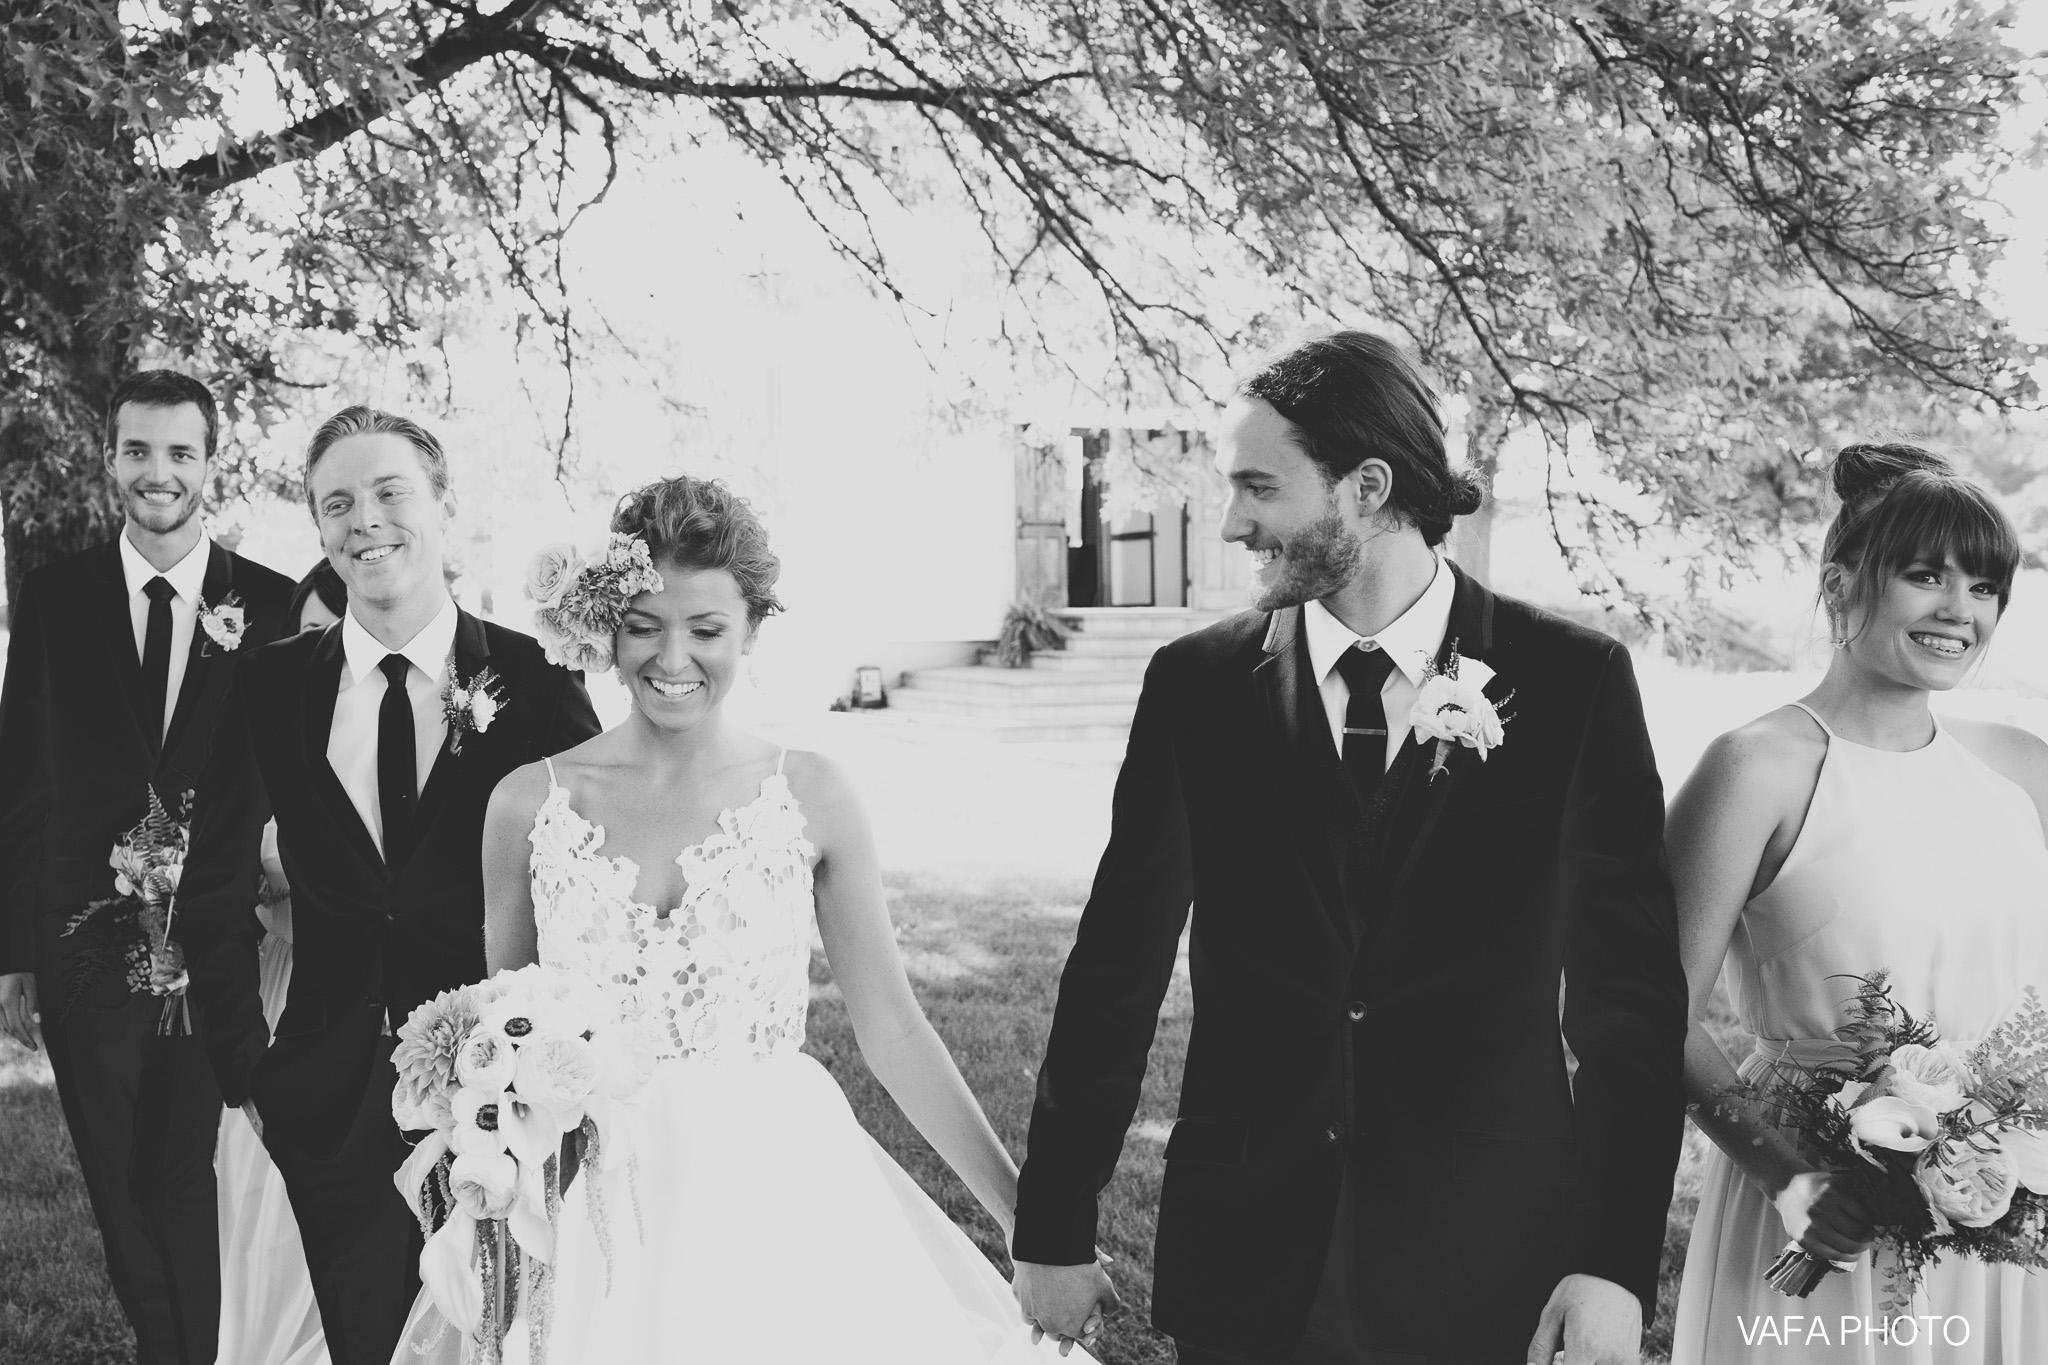 The-Felt-Estate-Wedding-Kailie-David-Vafa-Photo-524.jpg